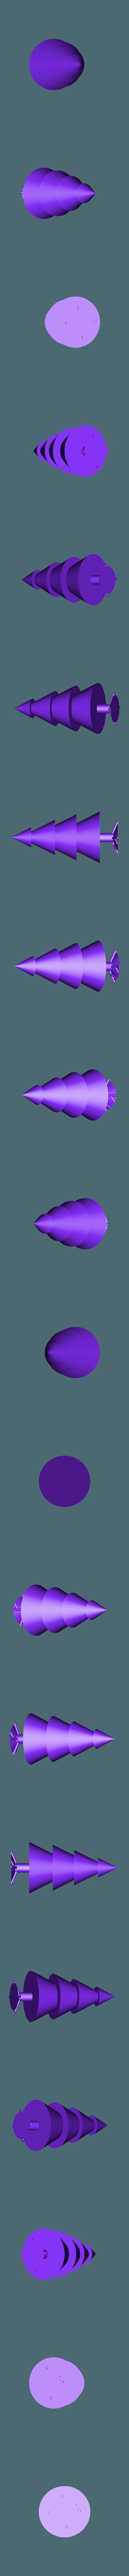 tree1_1.stl Download free STL file Low Effort Trees • Object to 3D print, Earsling